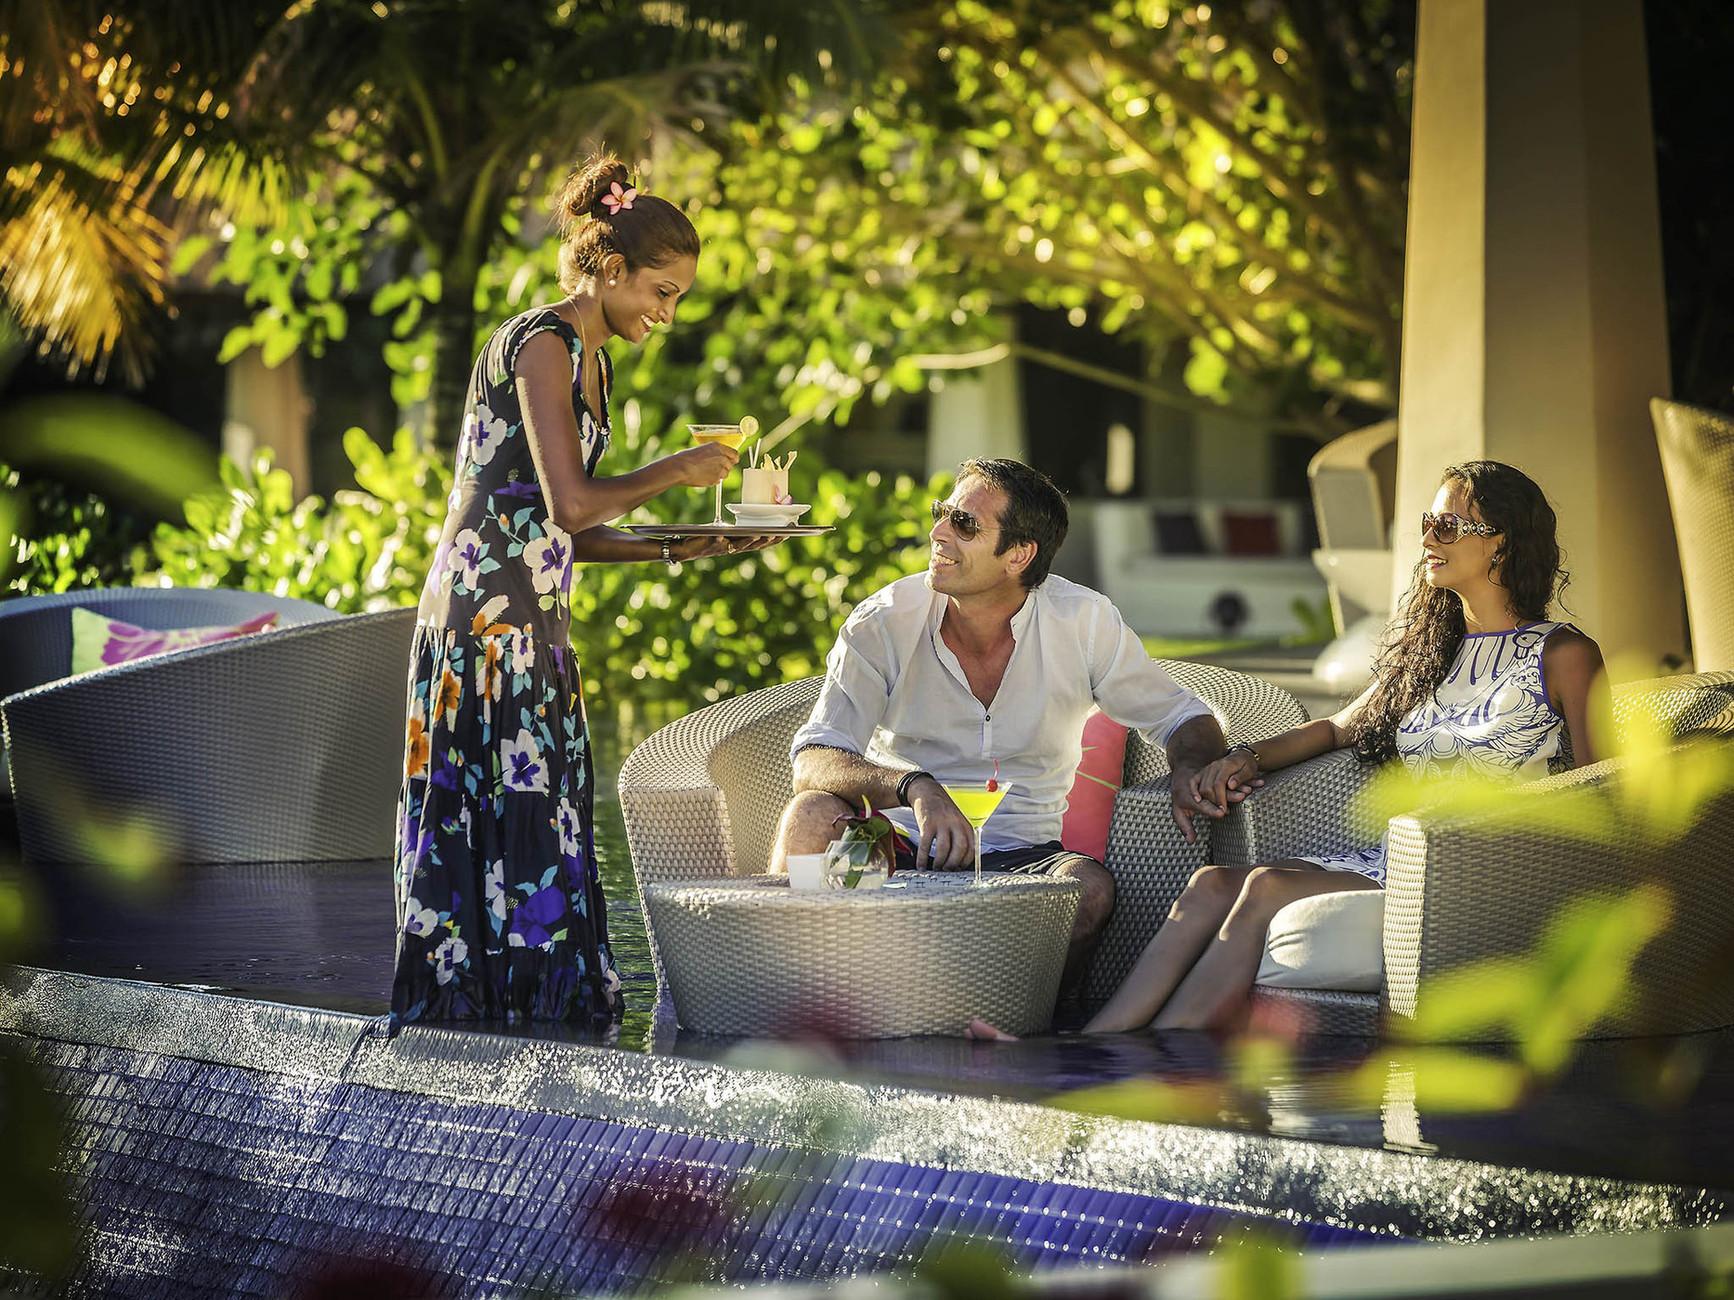 Готель бере участь у програмі «Планета 21» і працює в рамках концепції Positive Hospitality.